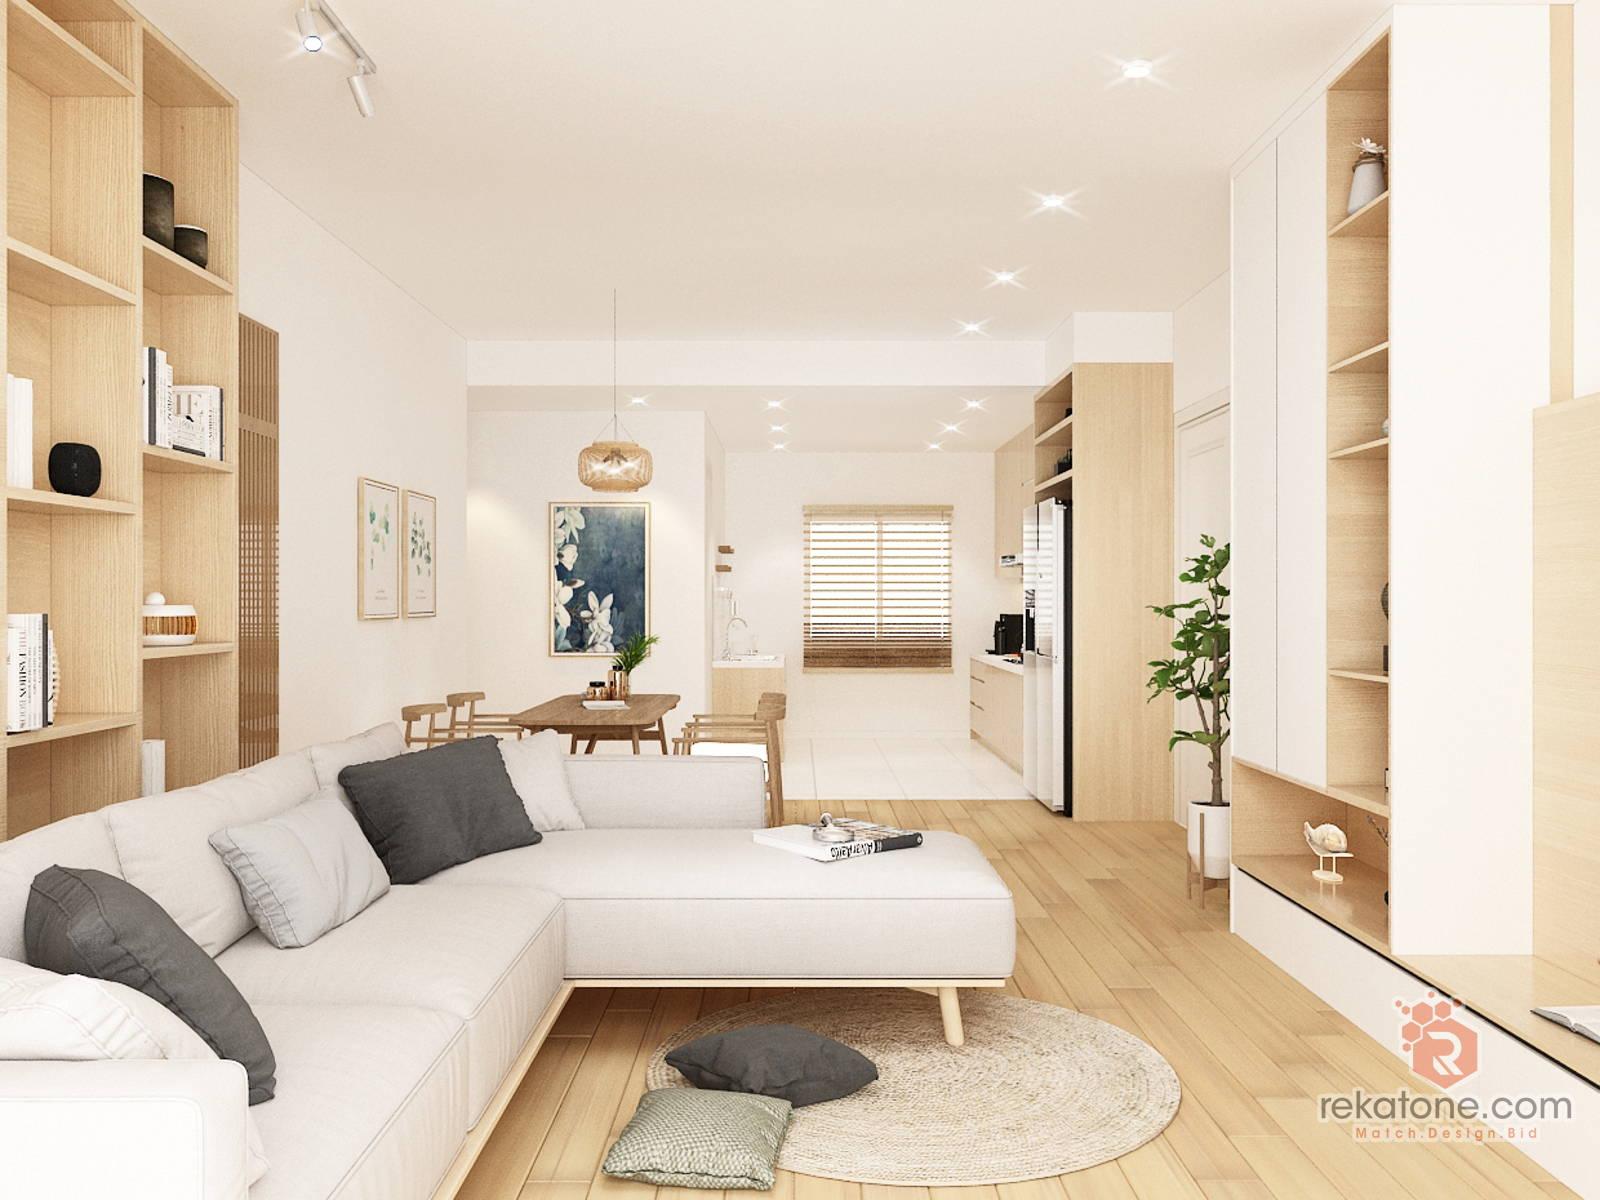 Condo and apartment interior design ideas 32   rekatone.com